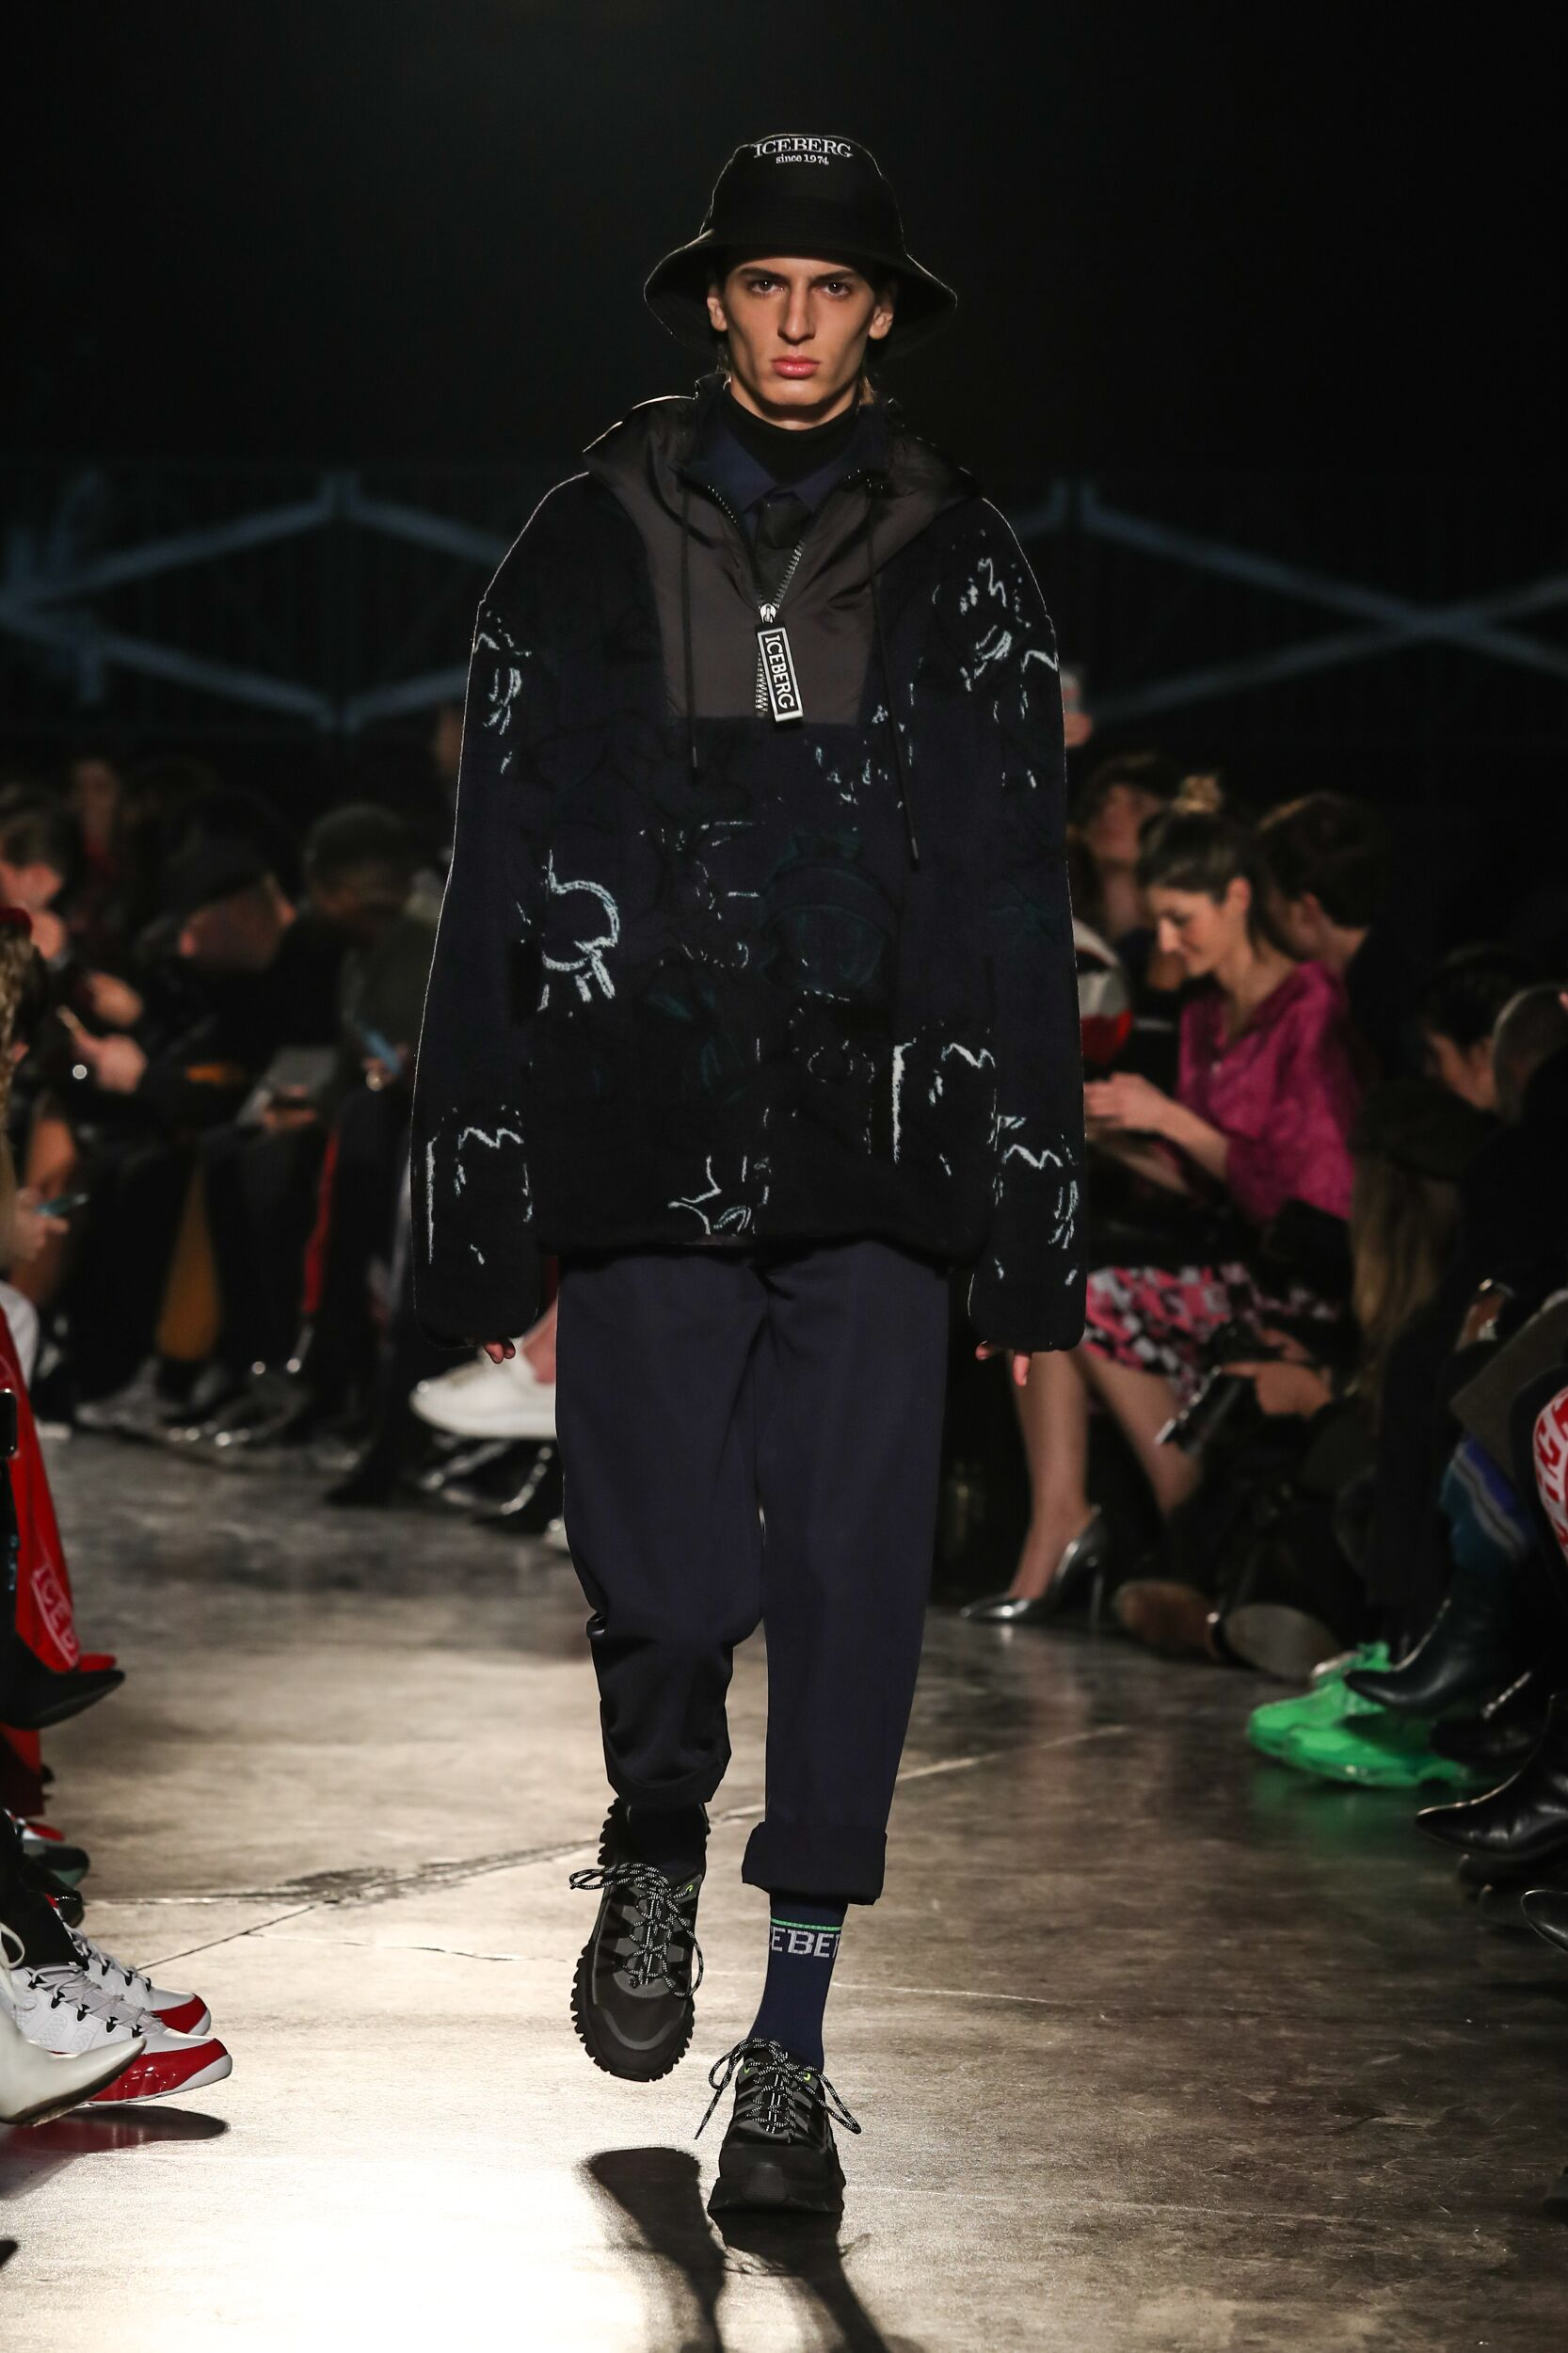 Fashion Show Man Model Iceberg Catwalk